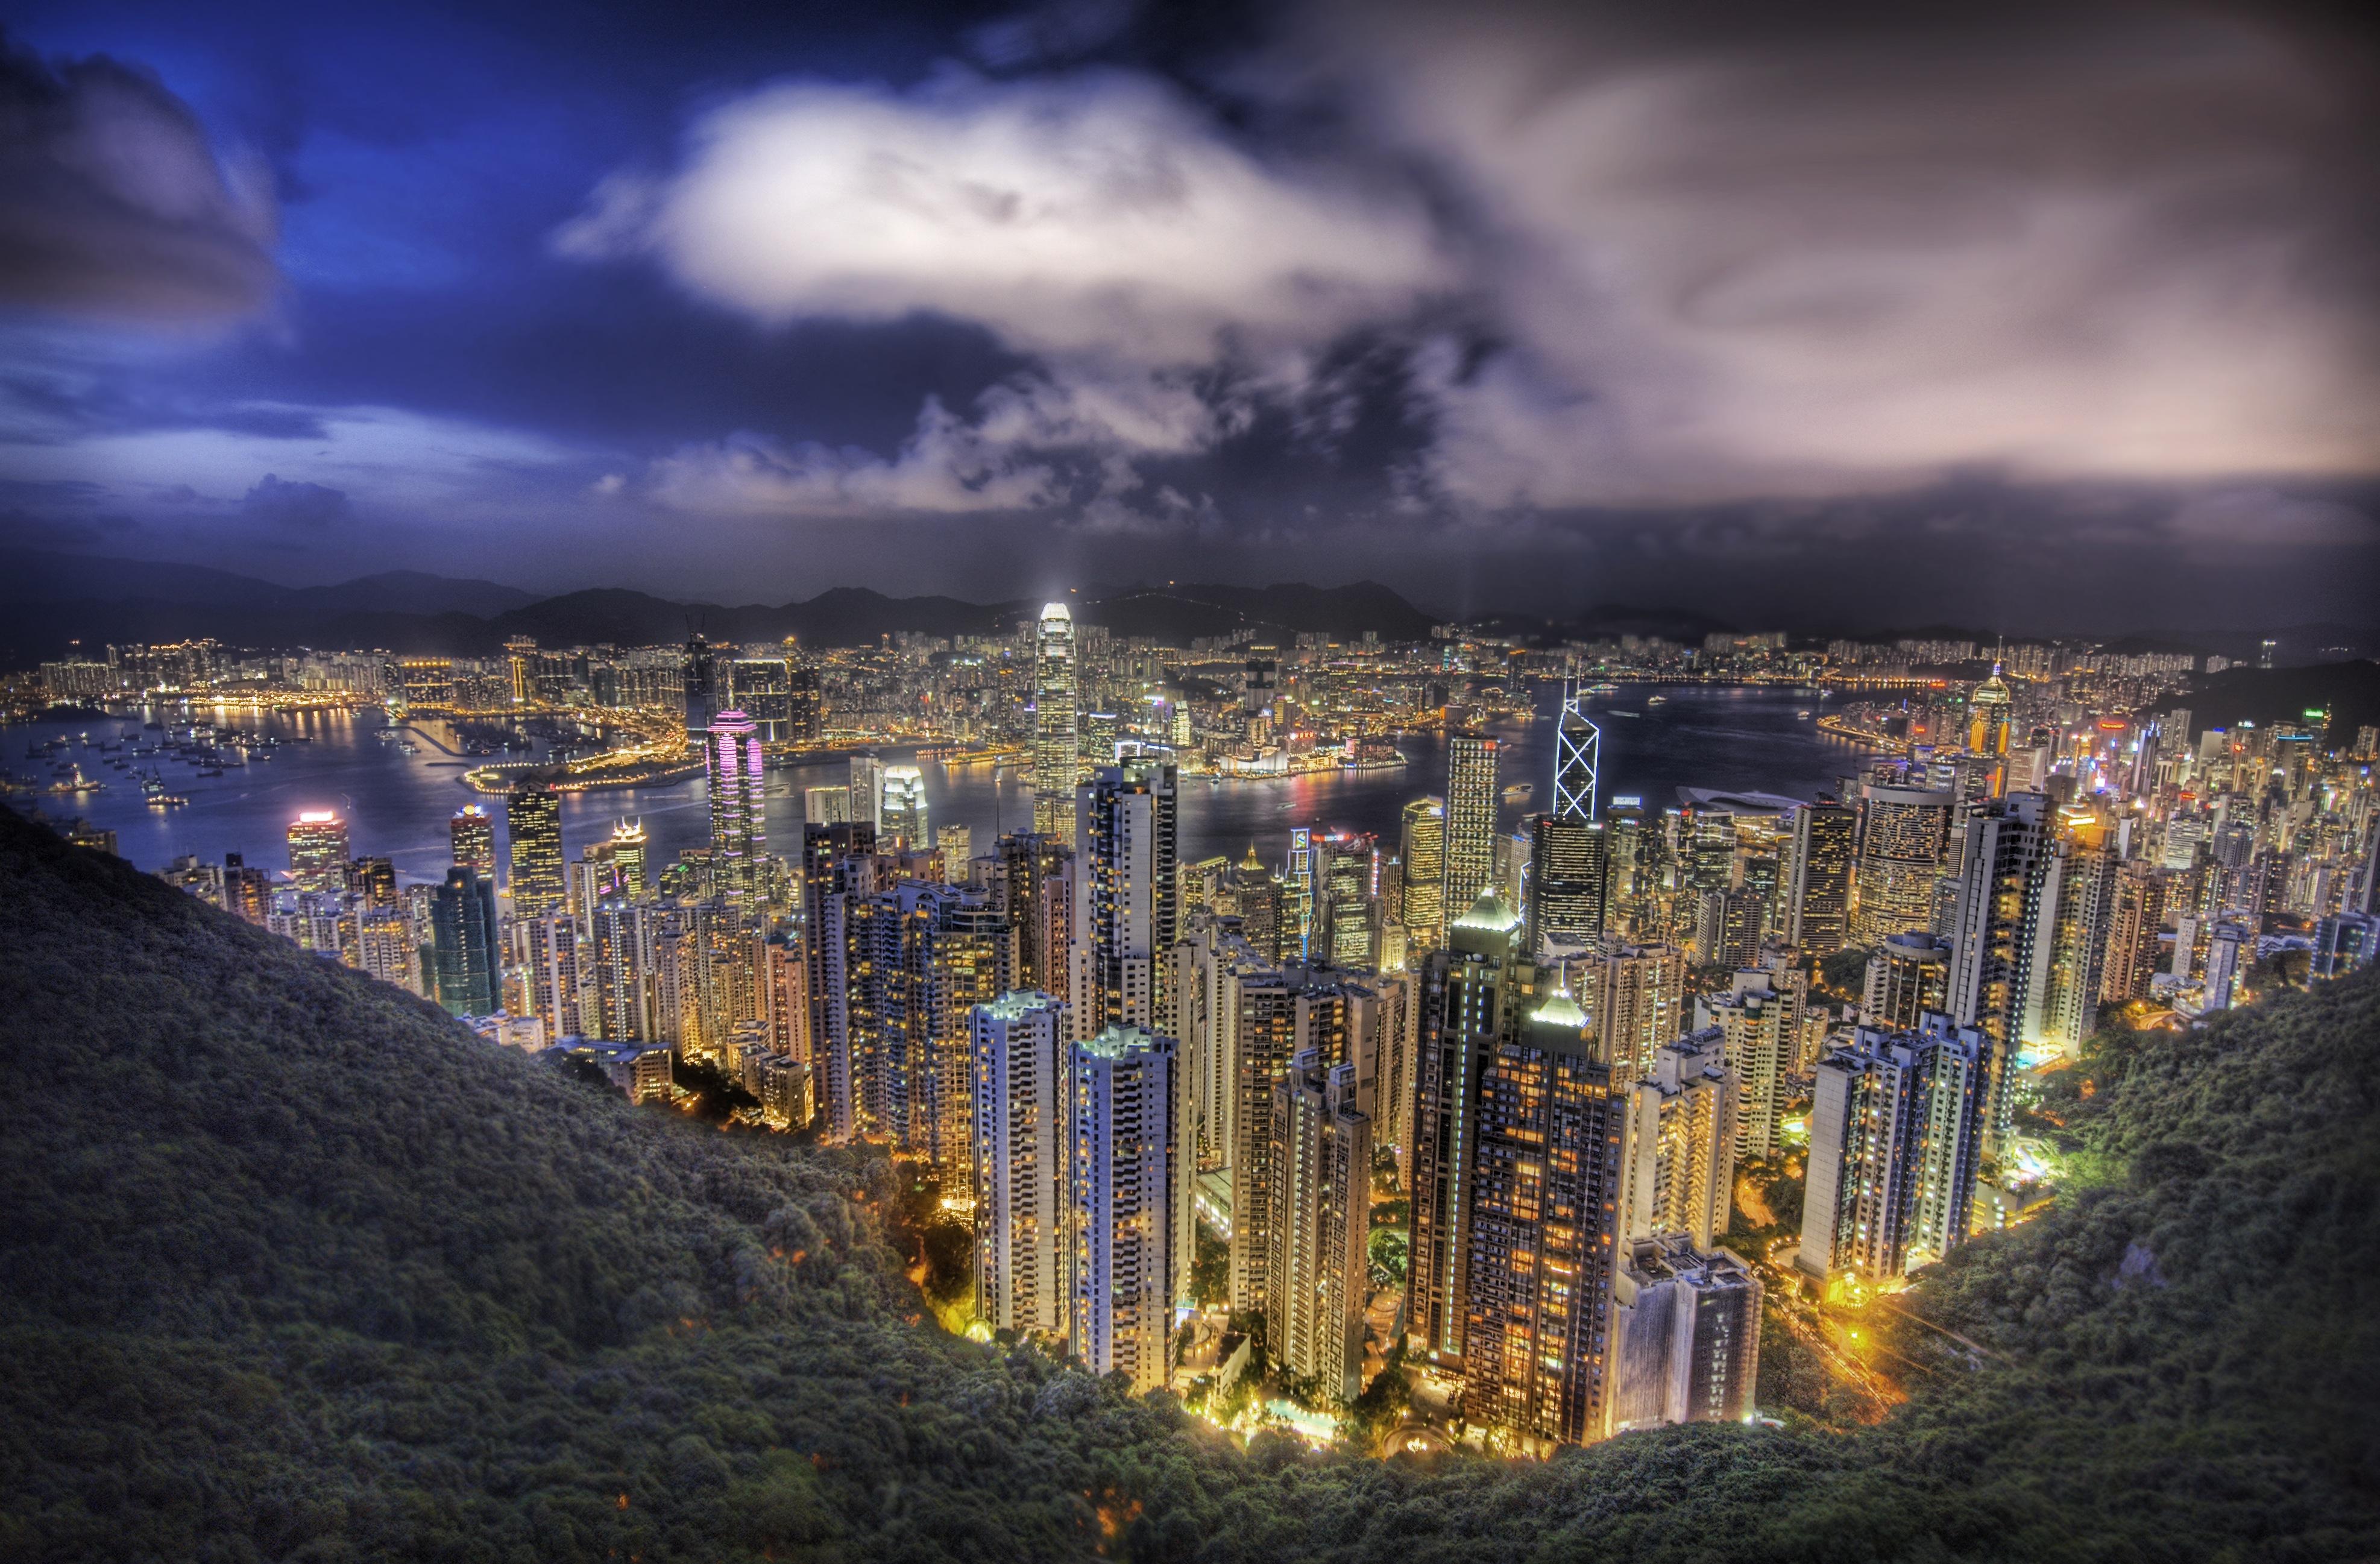 Hong Kong 4k Ultra HD Wallpaper   Background Image   3948x2594   ID:22041 - Wallpaper Abyss